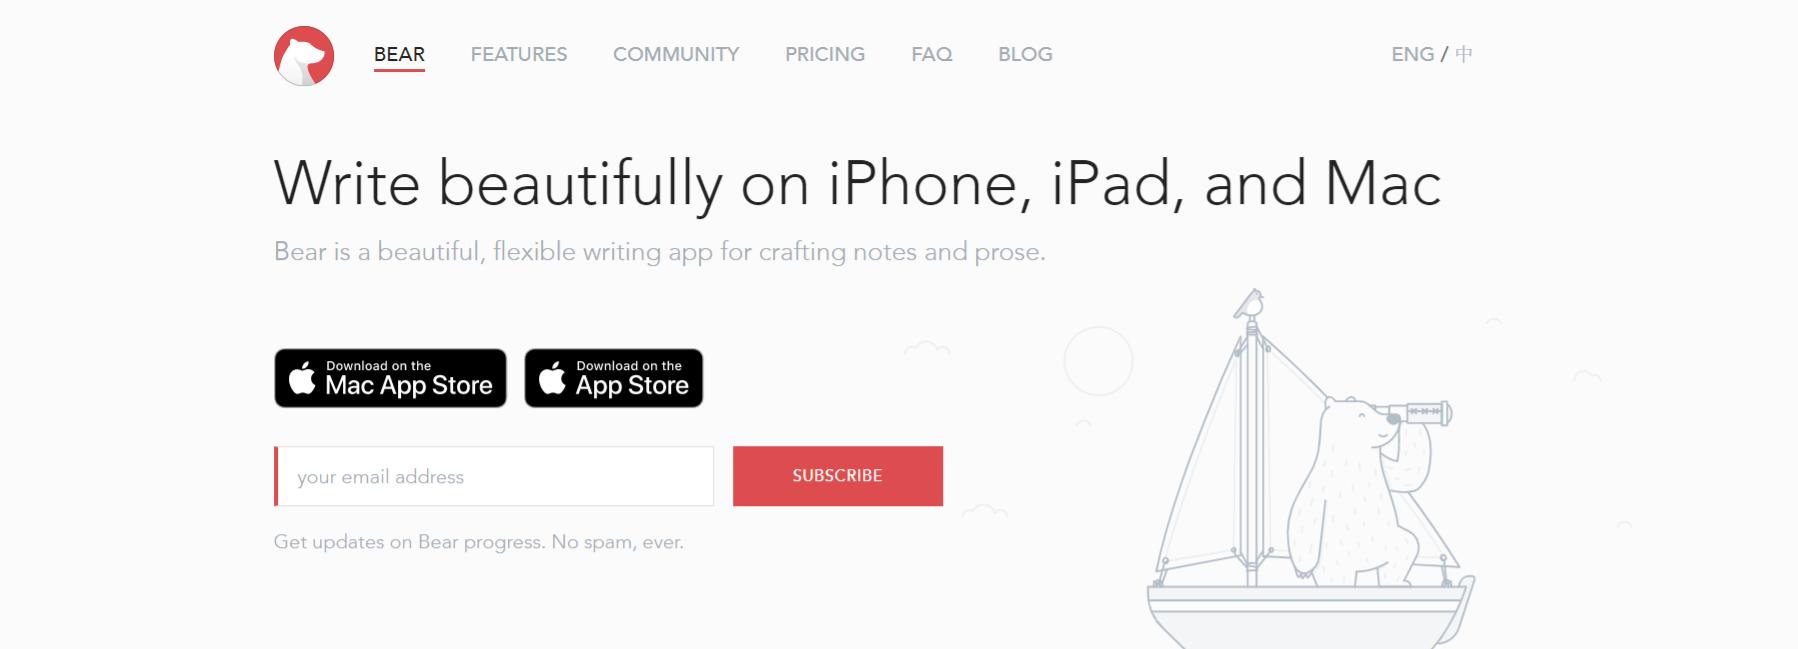 Bear app as wunderlist alternative